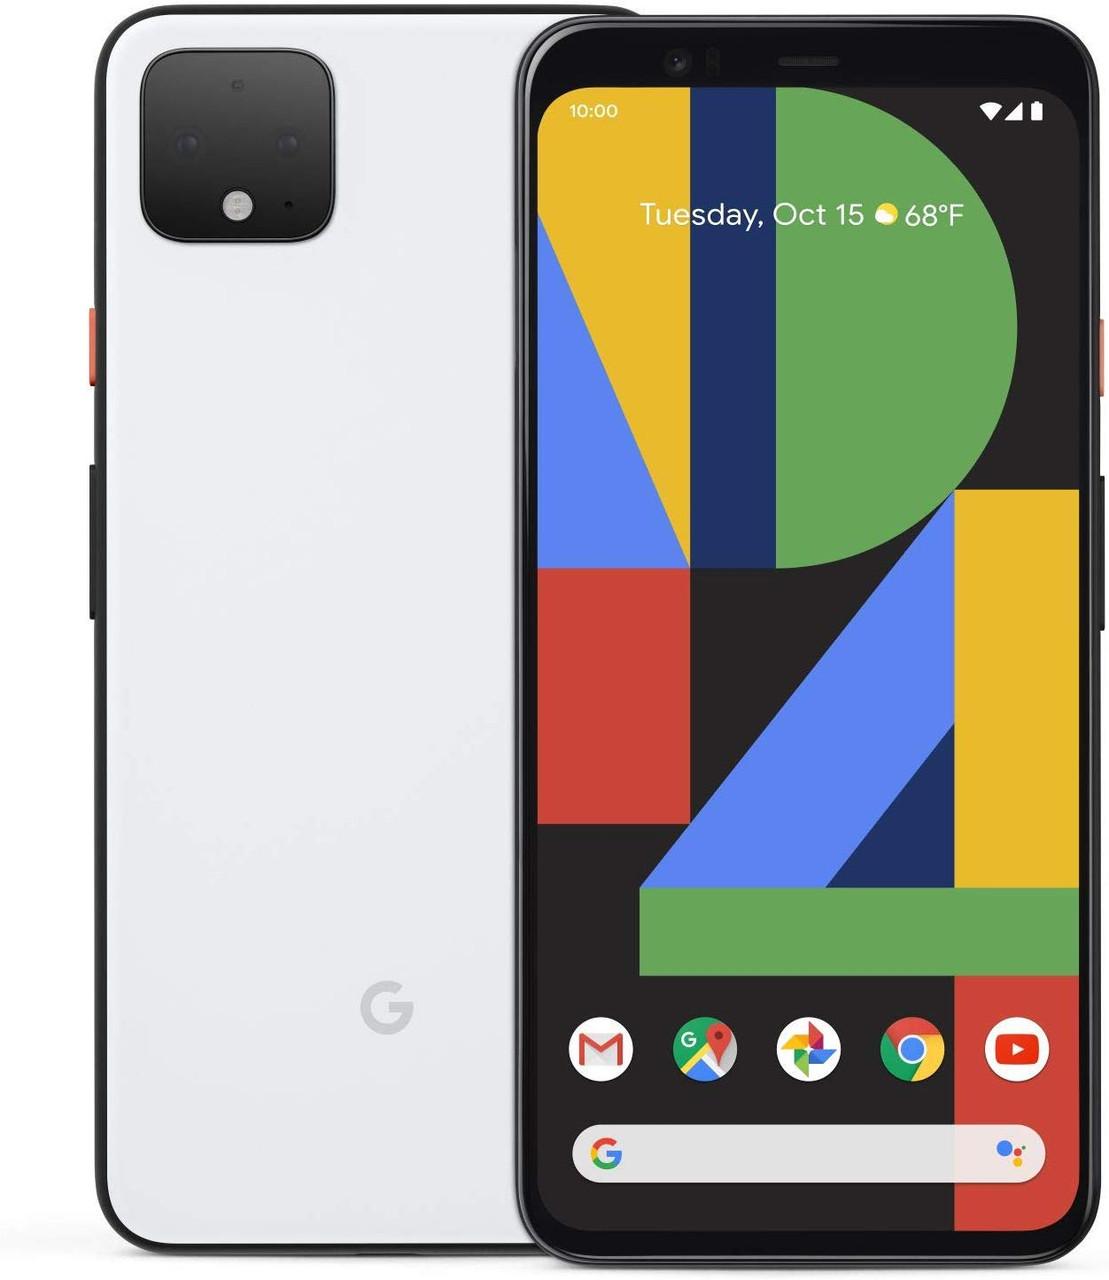 Google Pixel 4 XL Unlocked GSM/CDMA - US warranty